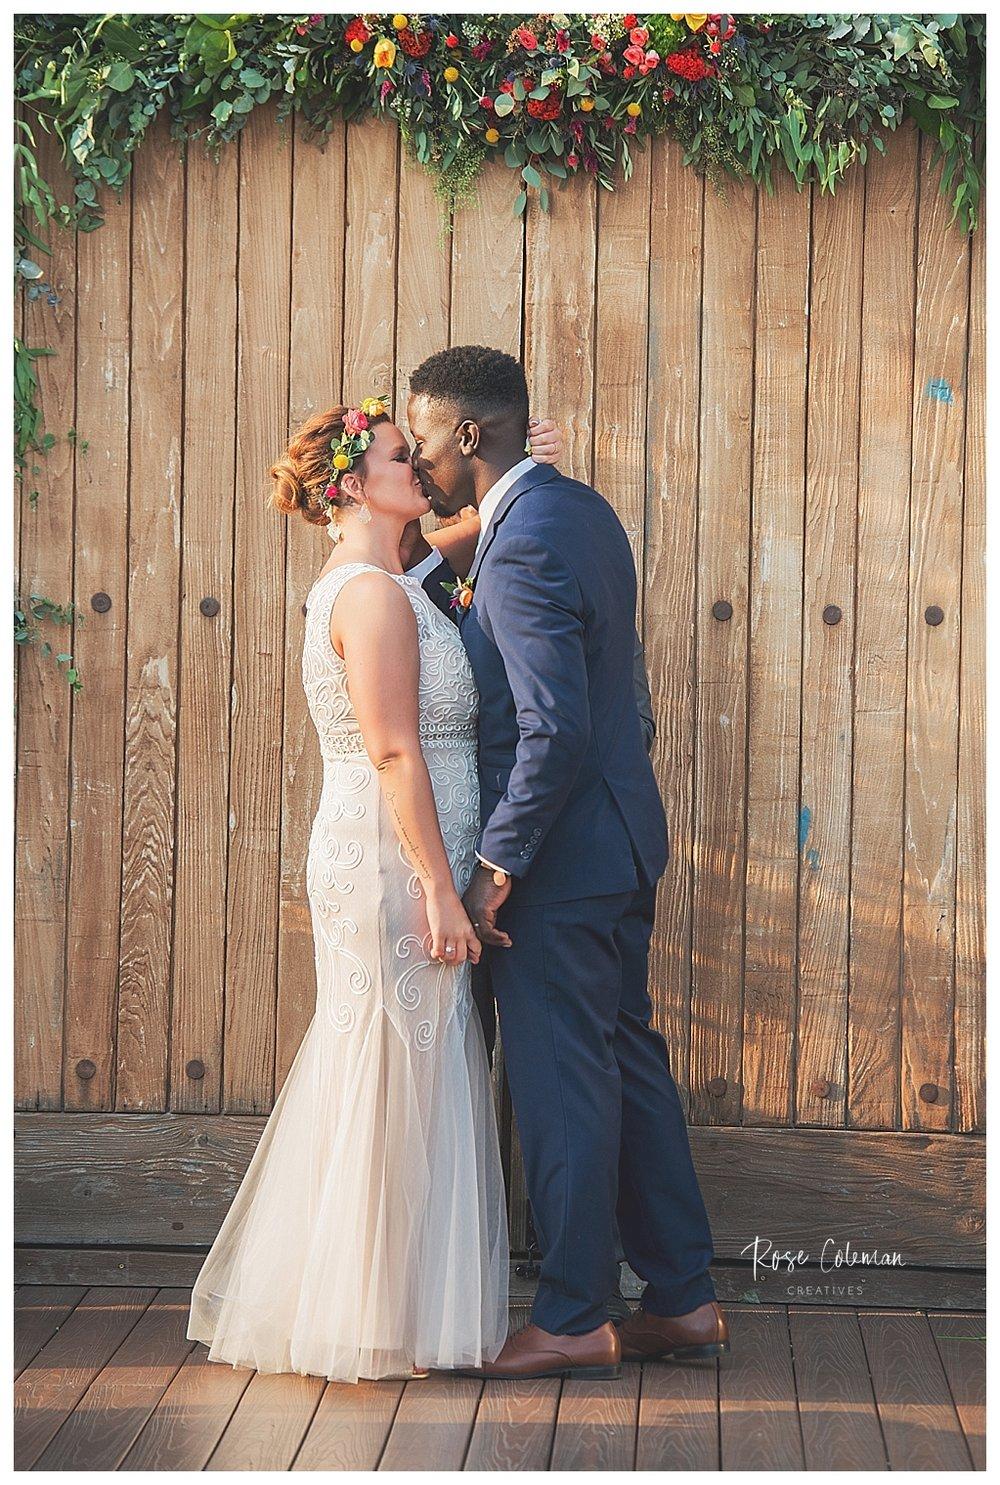 Rose_Coleman_Creatives_OKC_Wedding_Photography_Myriad_Gardens_148.jpg